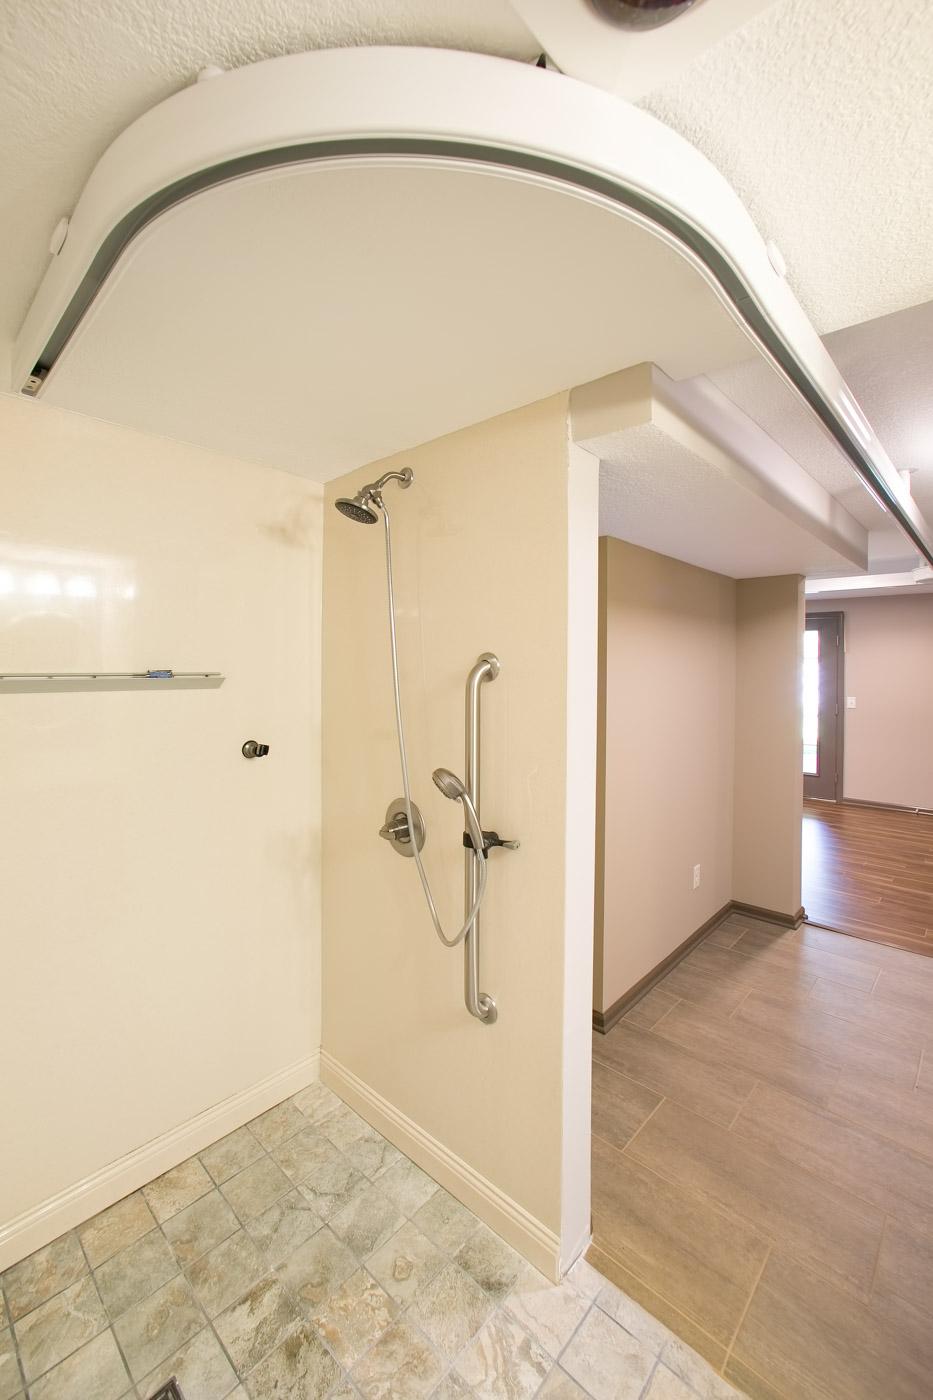 Twin Cities Accesibility Design Contractor-6 - James Barton Design-Build